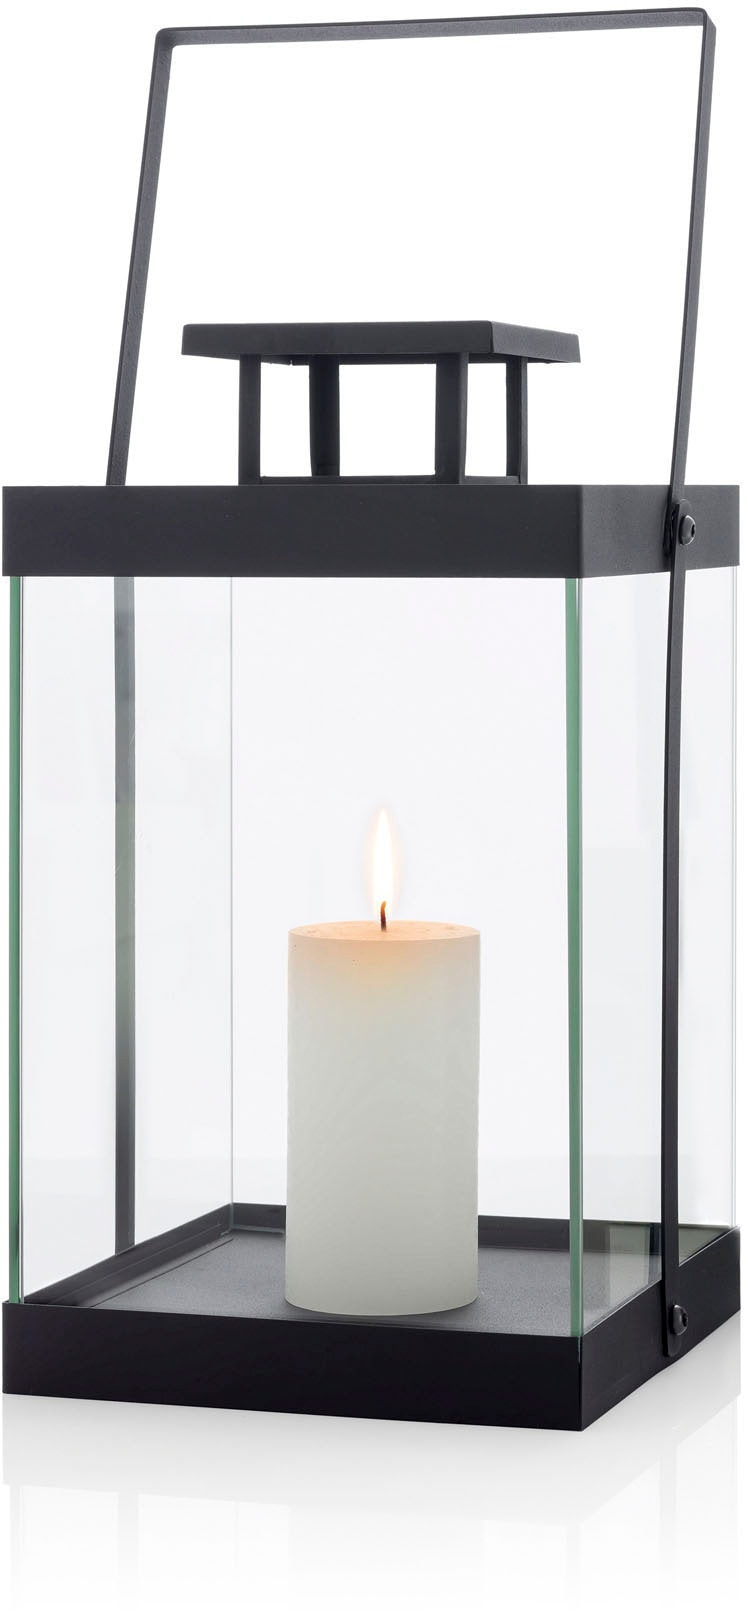 BLOMUS Kerzenlaterne Laterne -FINCA- mittel - black schwarz Kerzenhalter Kerzen Laternen Wohnaccessoires